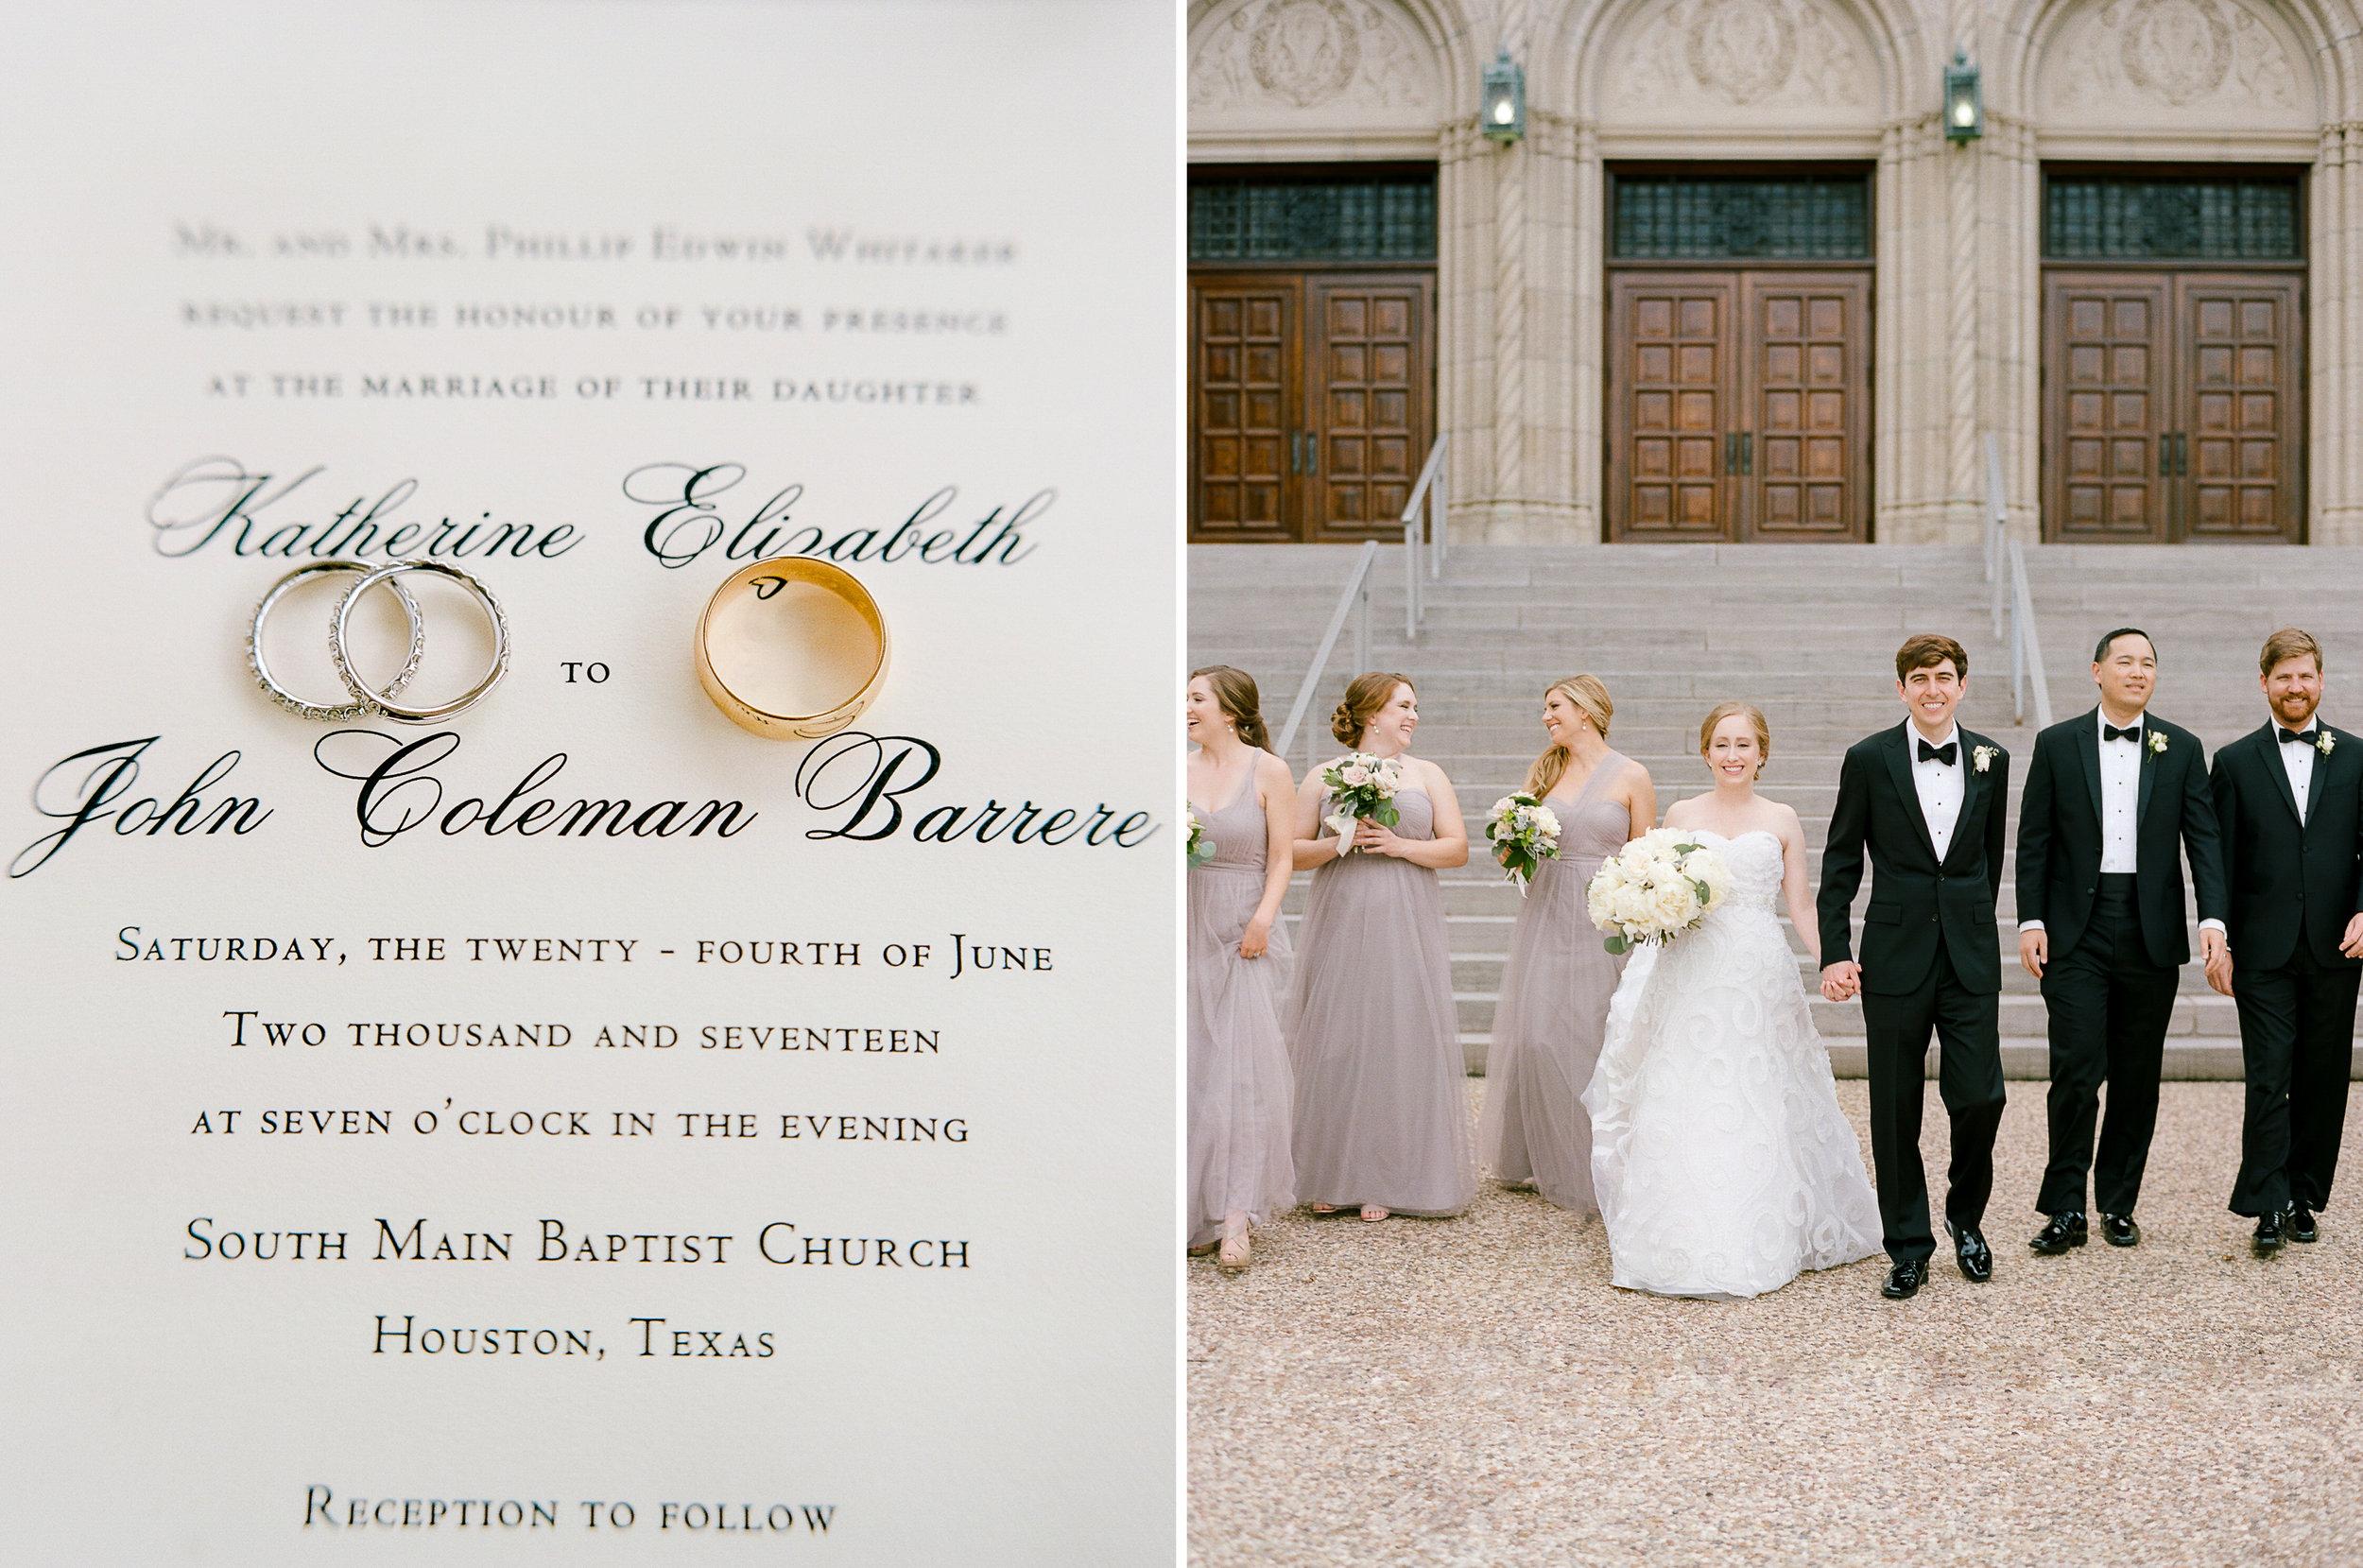 houston-wedding-planner-fine-art-luxury-designer-top-best-destination-austin-dallas-kelly-doonan-events-river-oaks-country-club-122